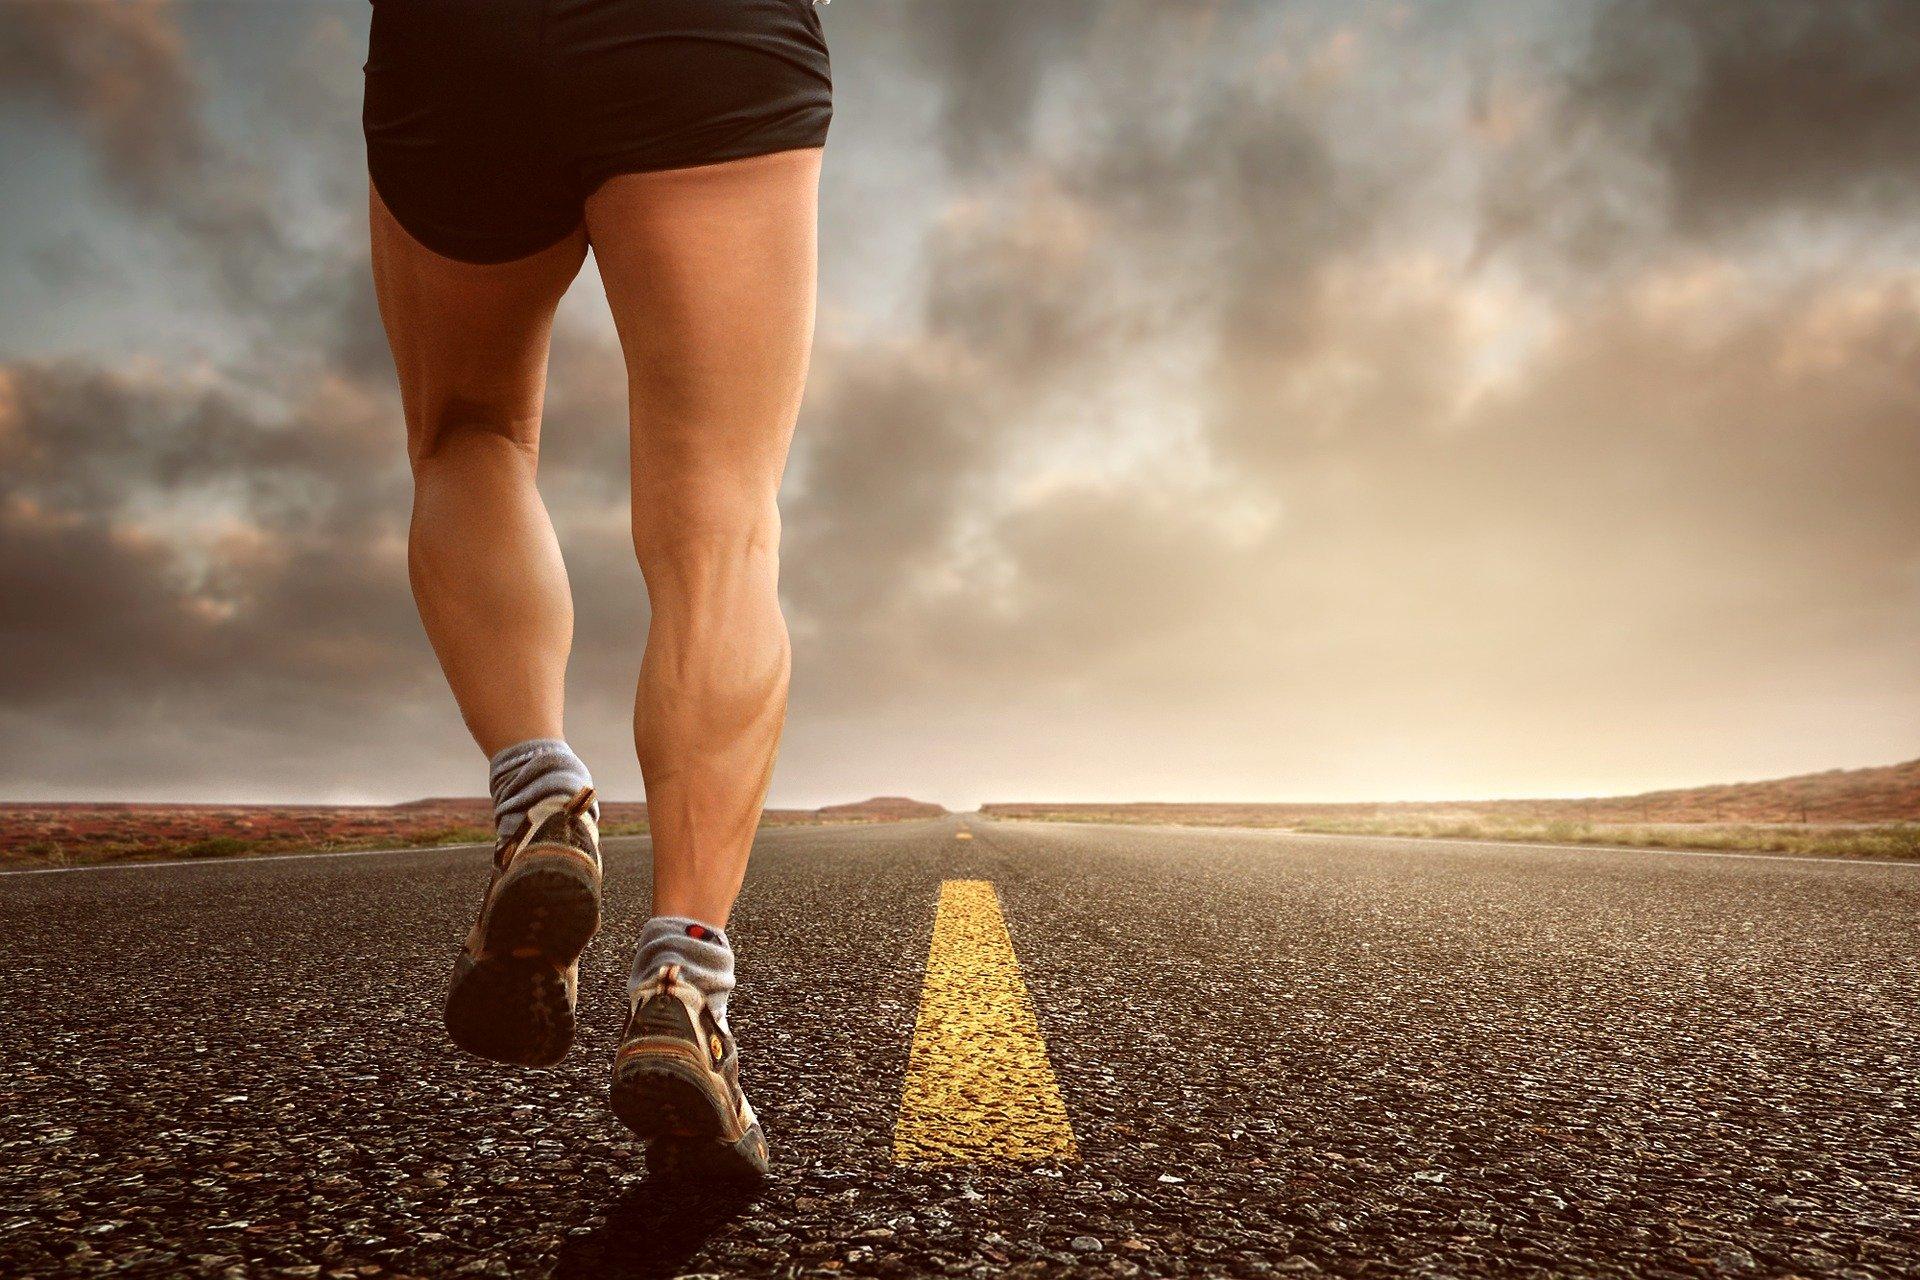 Alto Rendimiento Deportivo. imagen kinkate jogging-2343558_1920